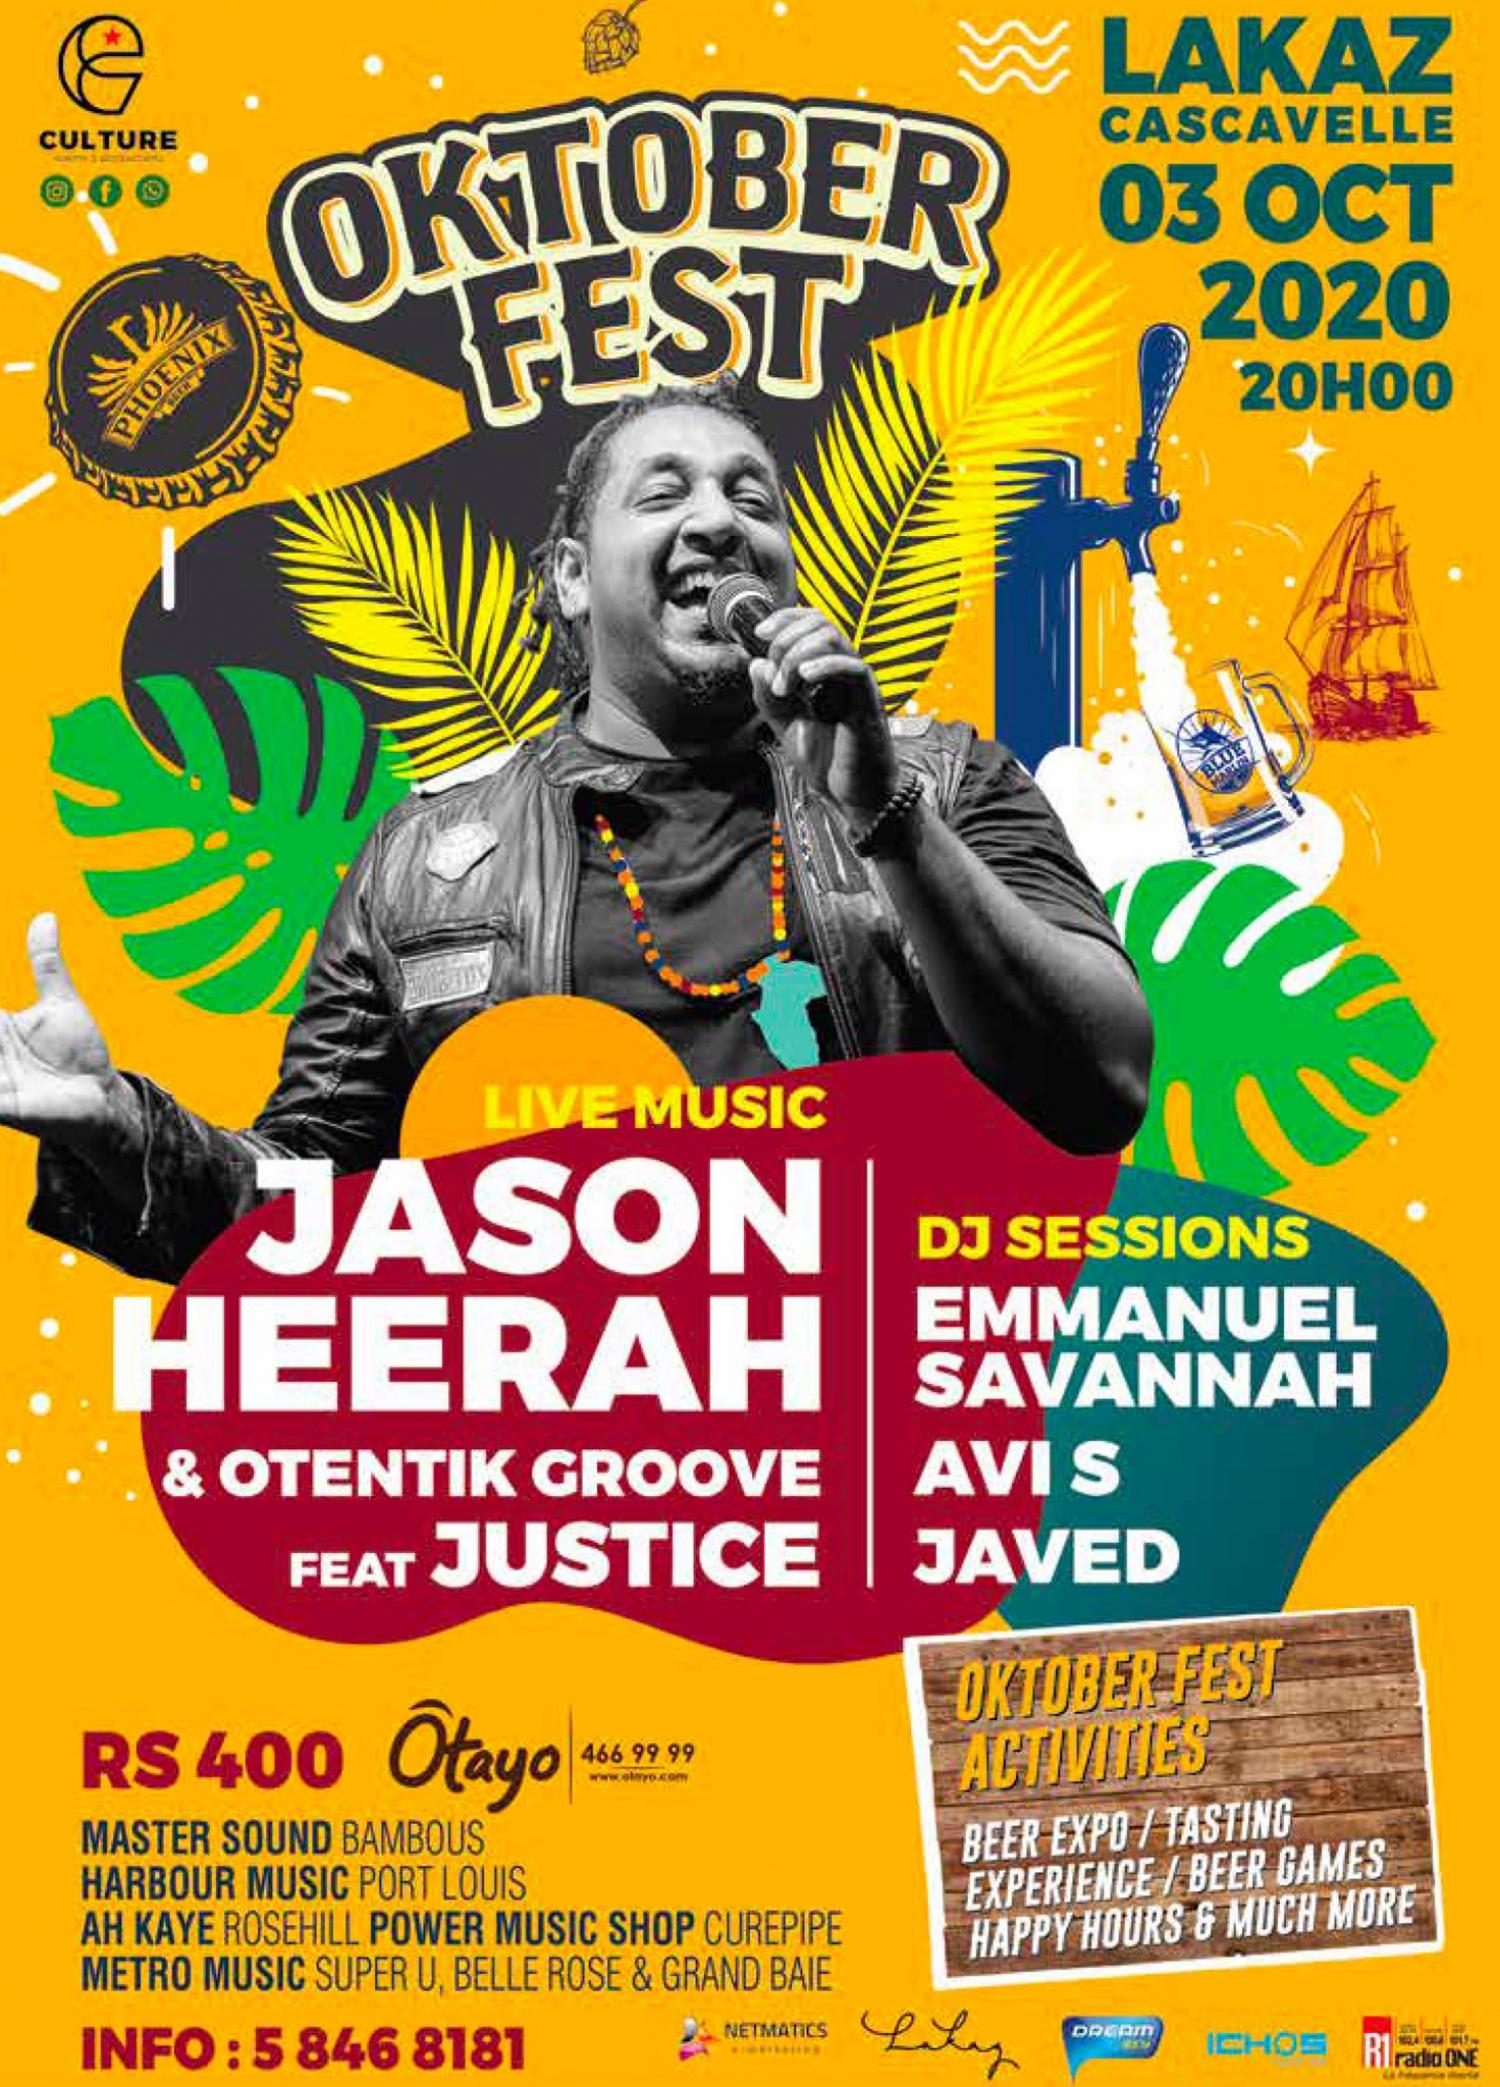 Oktober Fest - Jason Heerah & Otentik Groove ft Justice